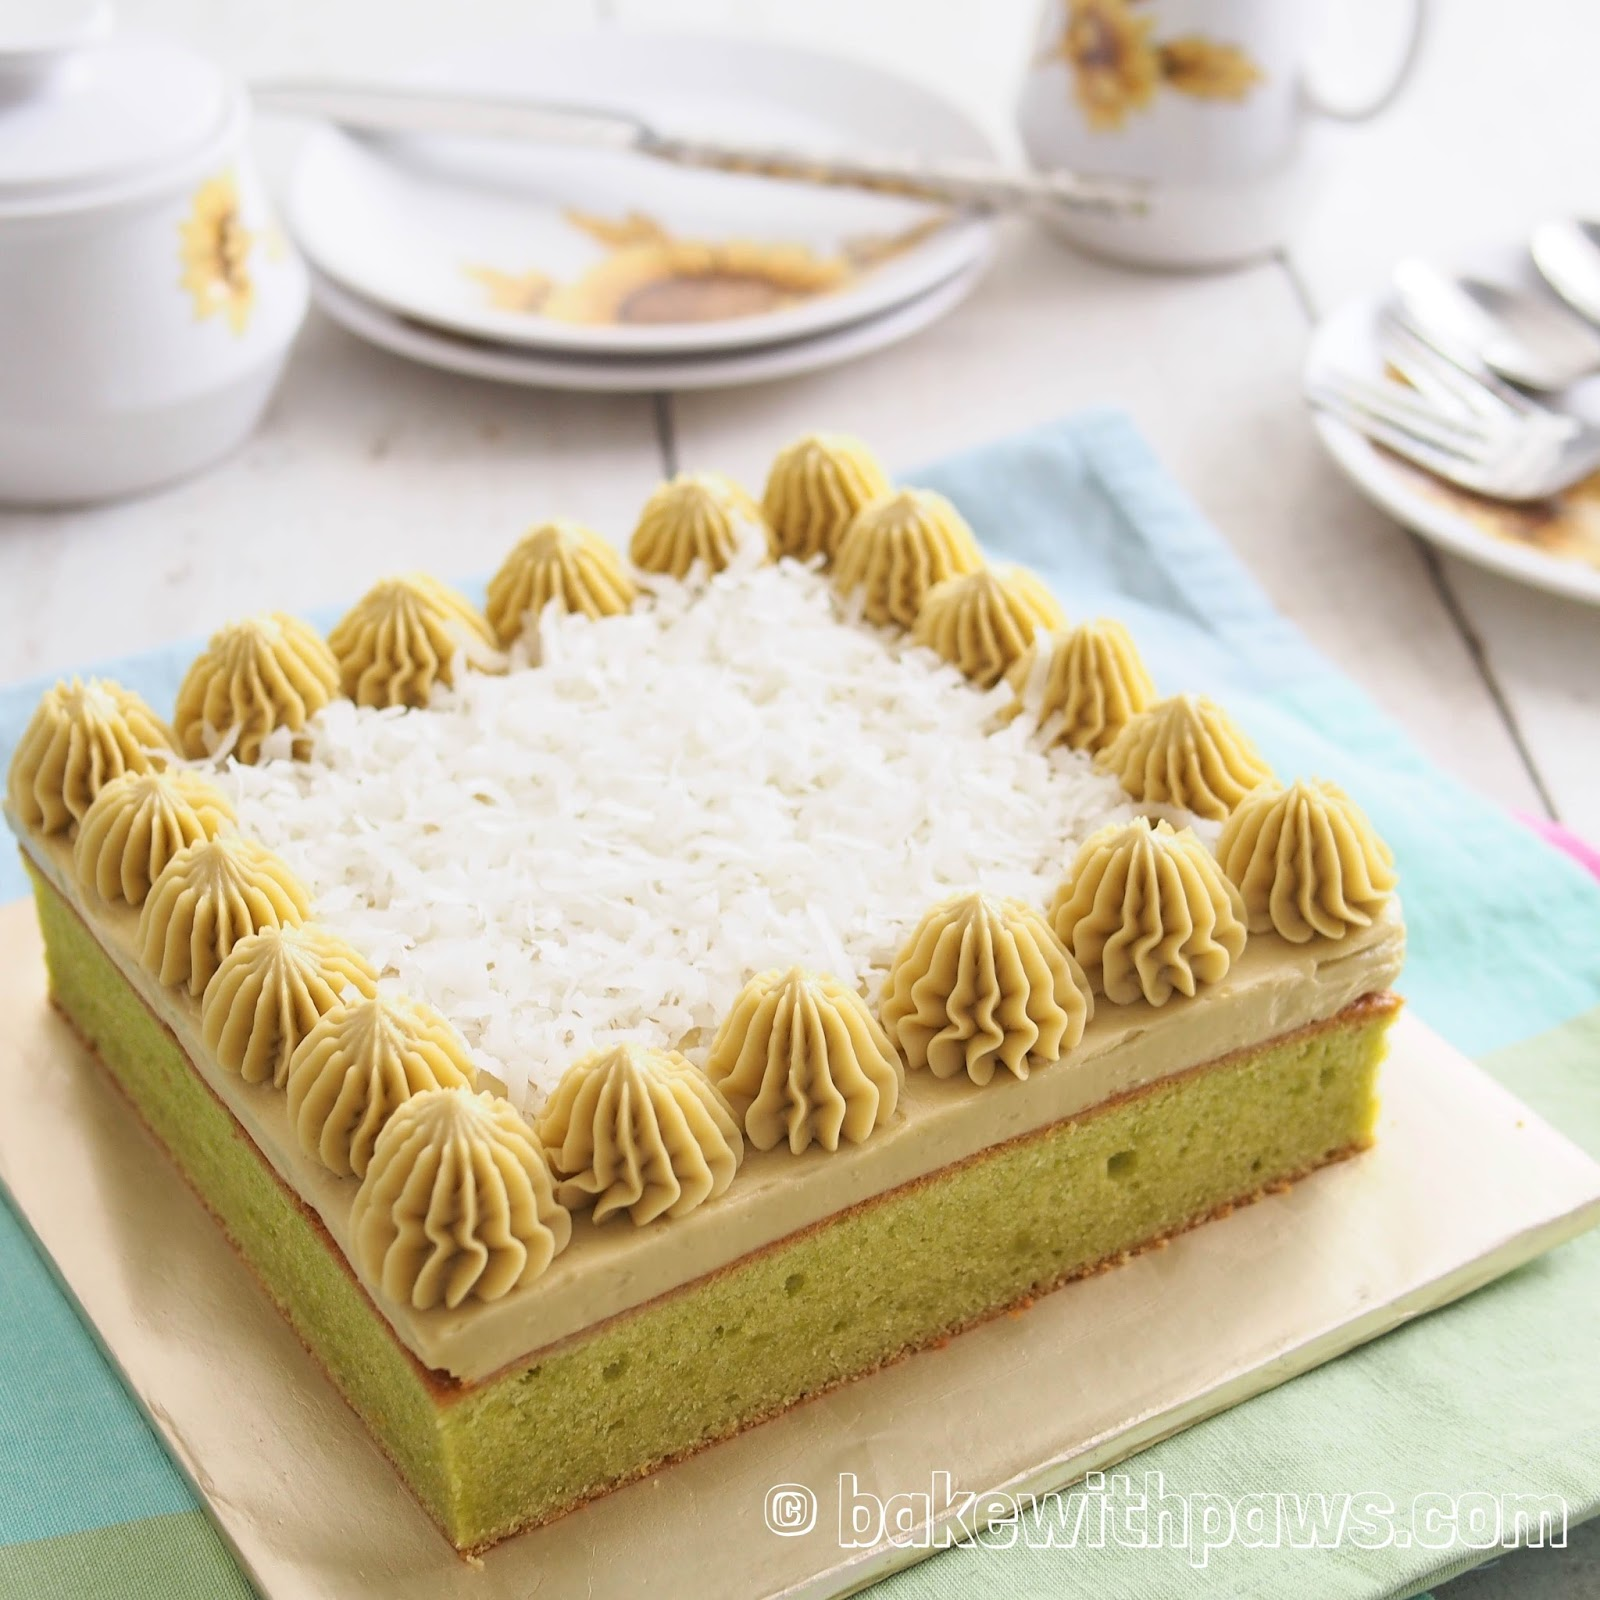 Pandan Butter Cake With Gula Melaka Swiss Meringue